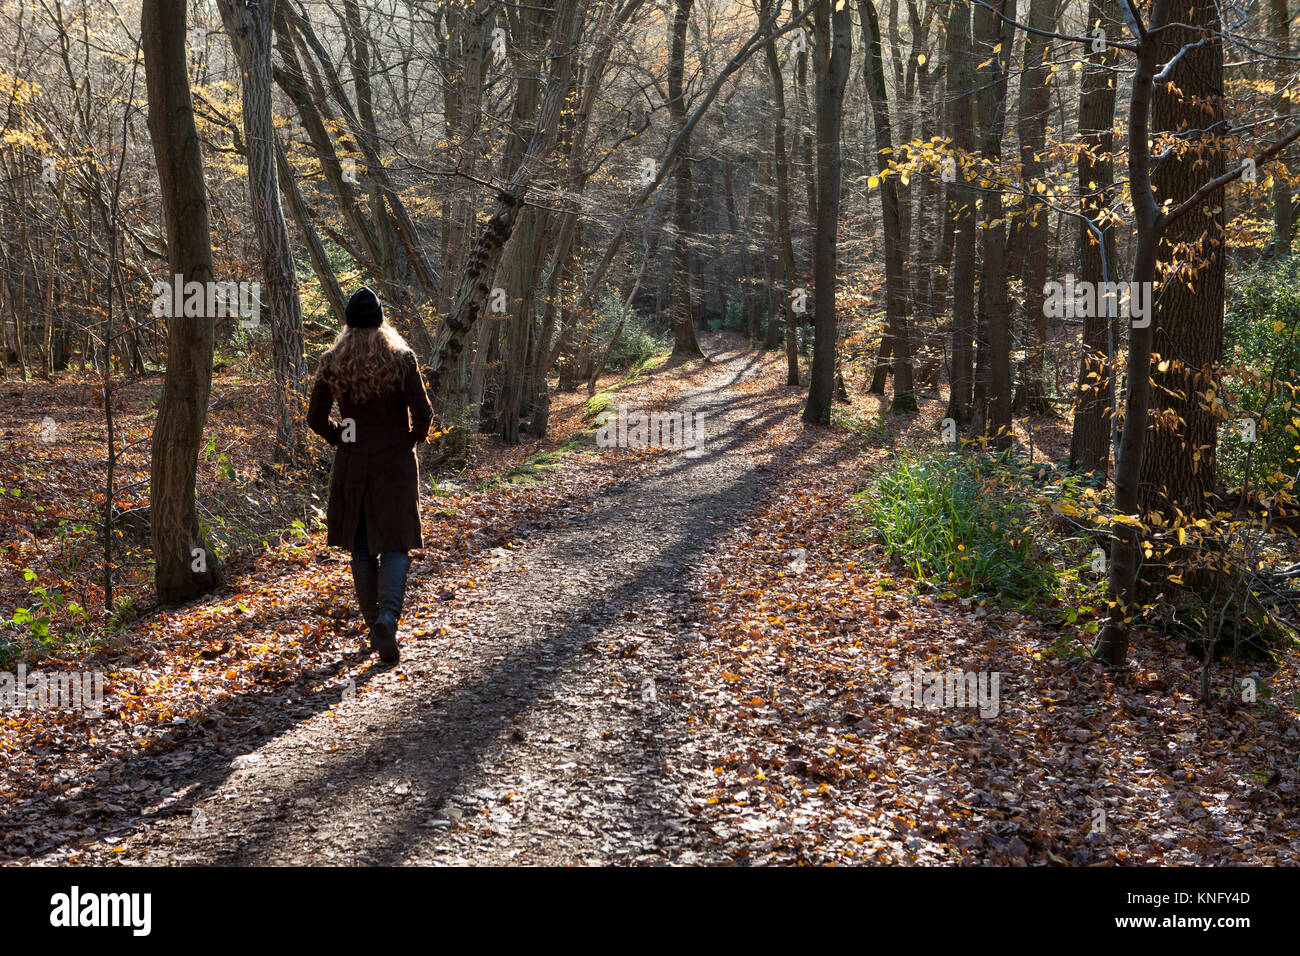 Lady walking through Broxbourne Woods, National Nature Reserve, along pathway - Stock Image